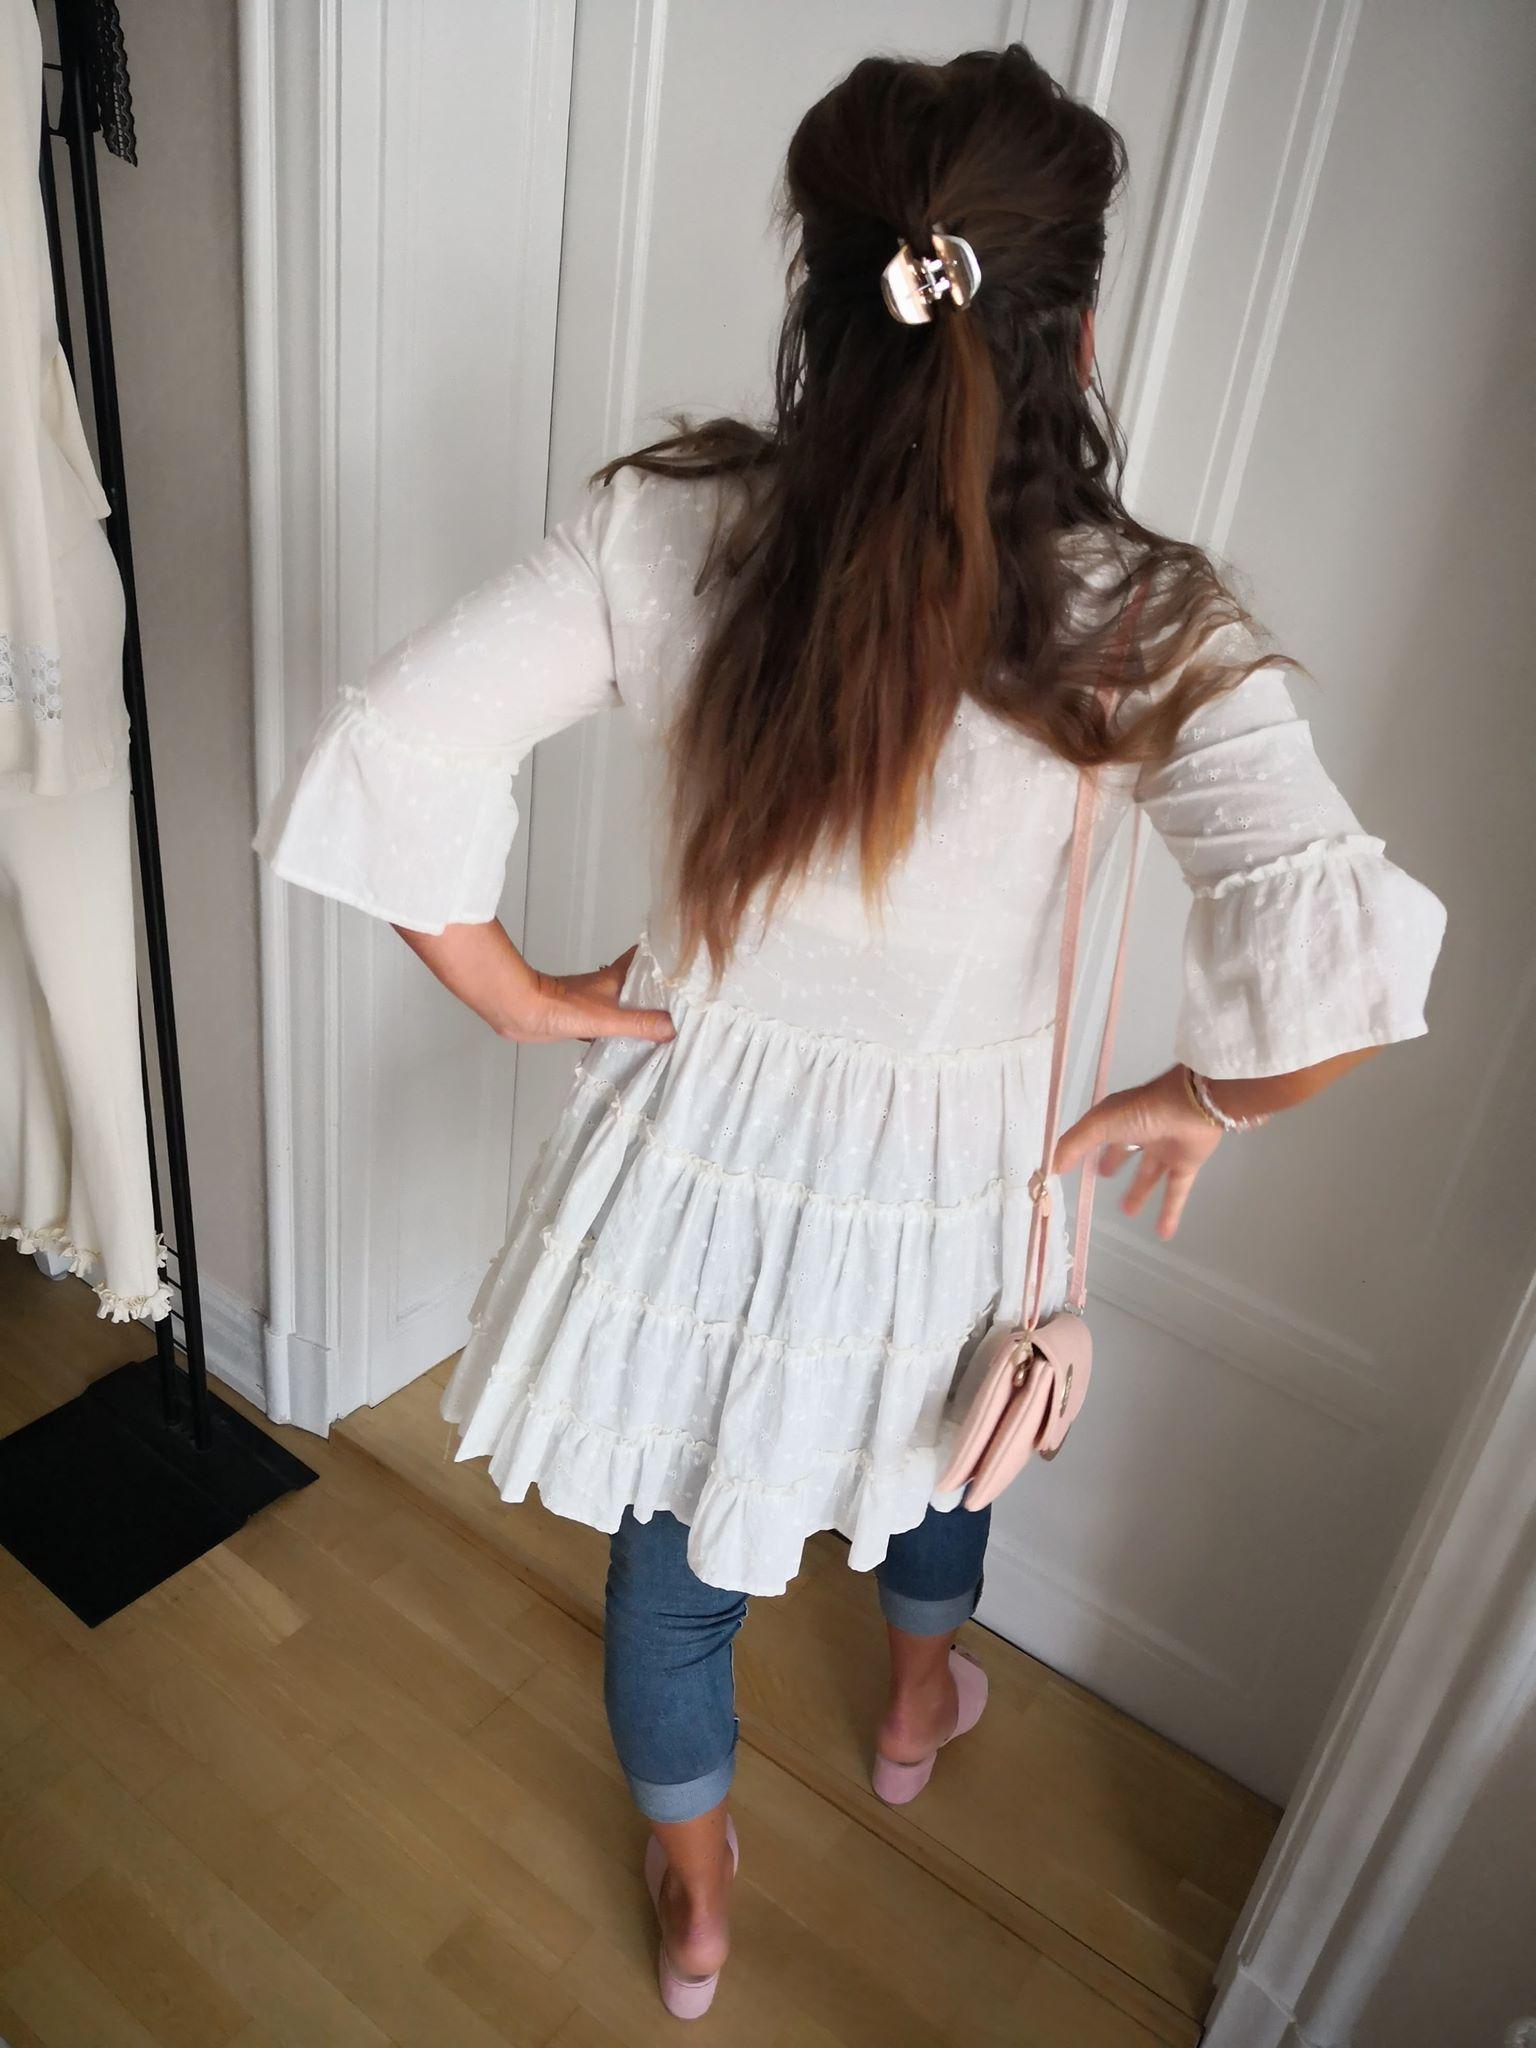 countrychic-klänning